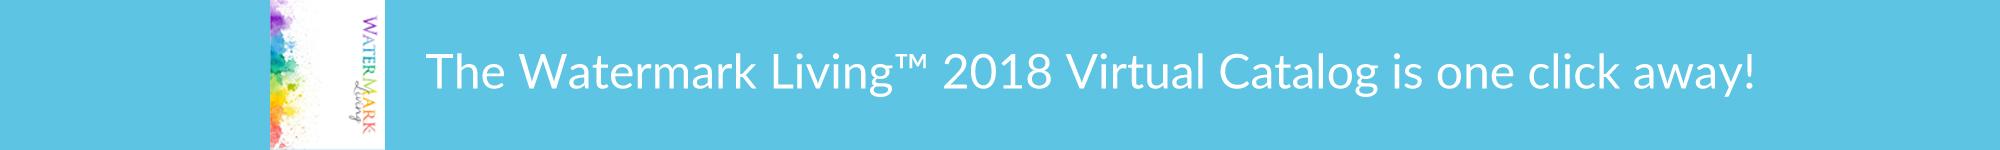 2018-catalog-banner-071018-copy.jpg